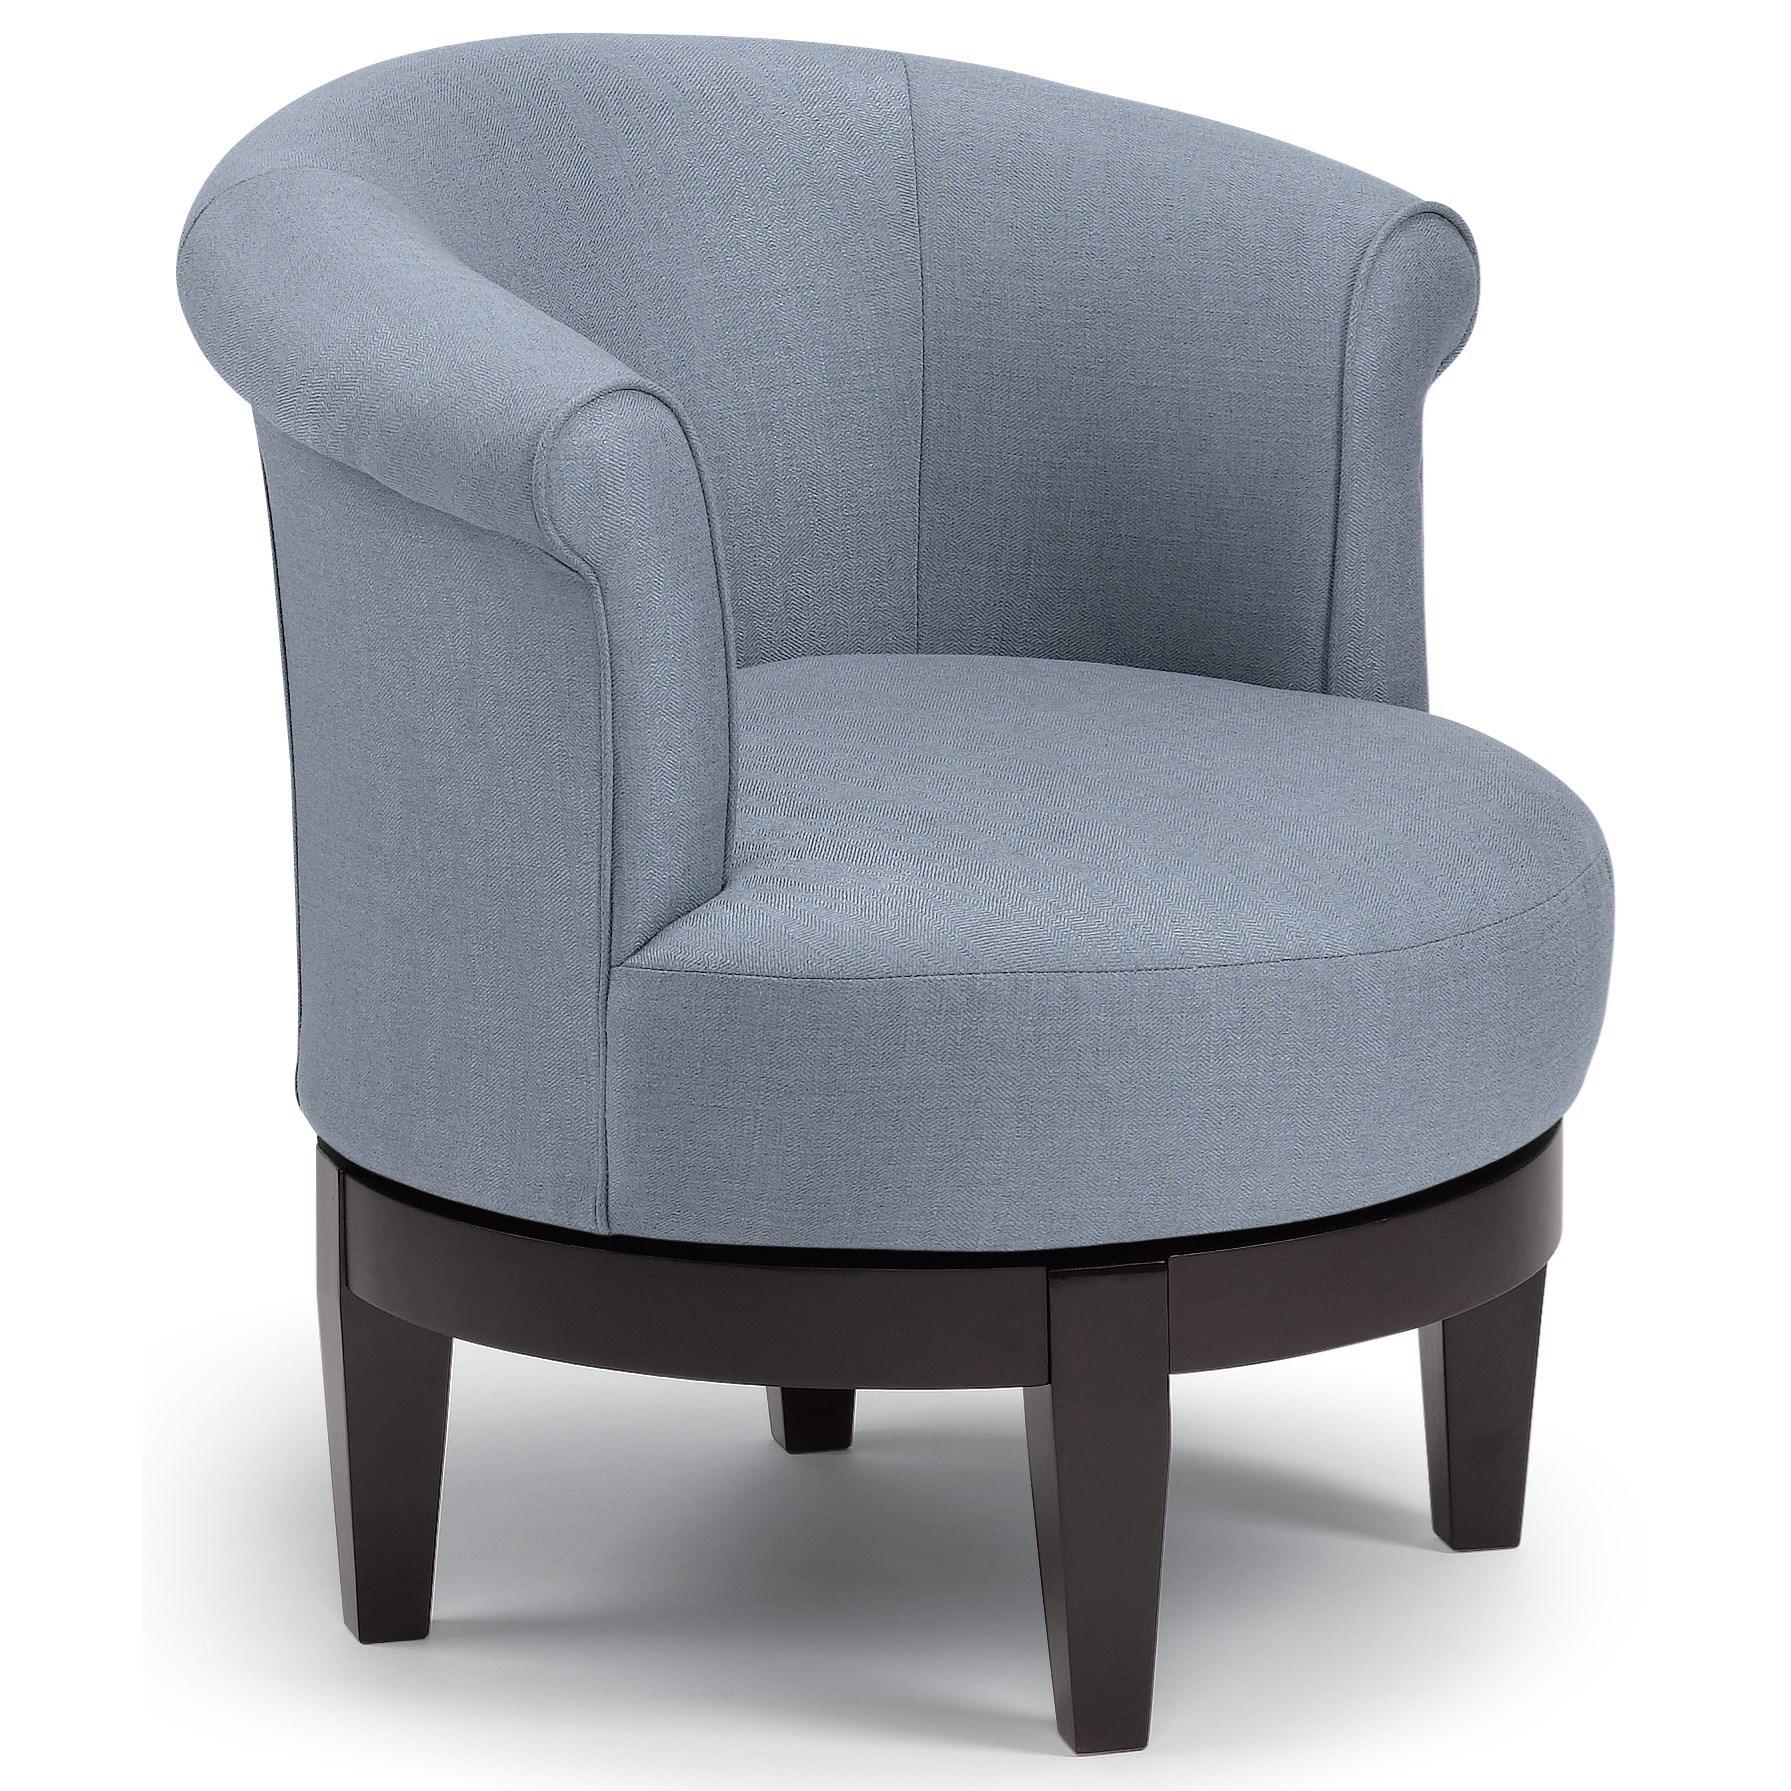 Superieur Best Home Furnishings Chairs   Swivel BarrelAttica Swivel Chair